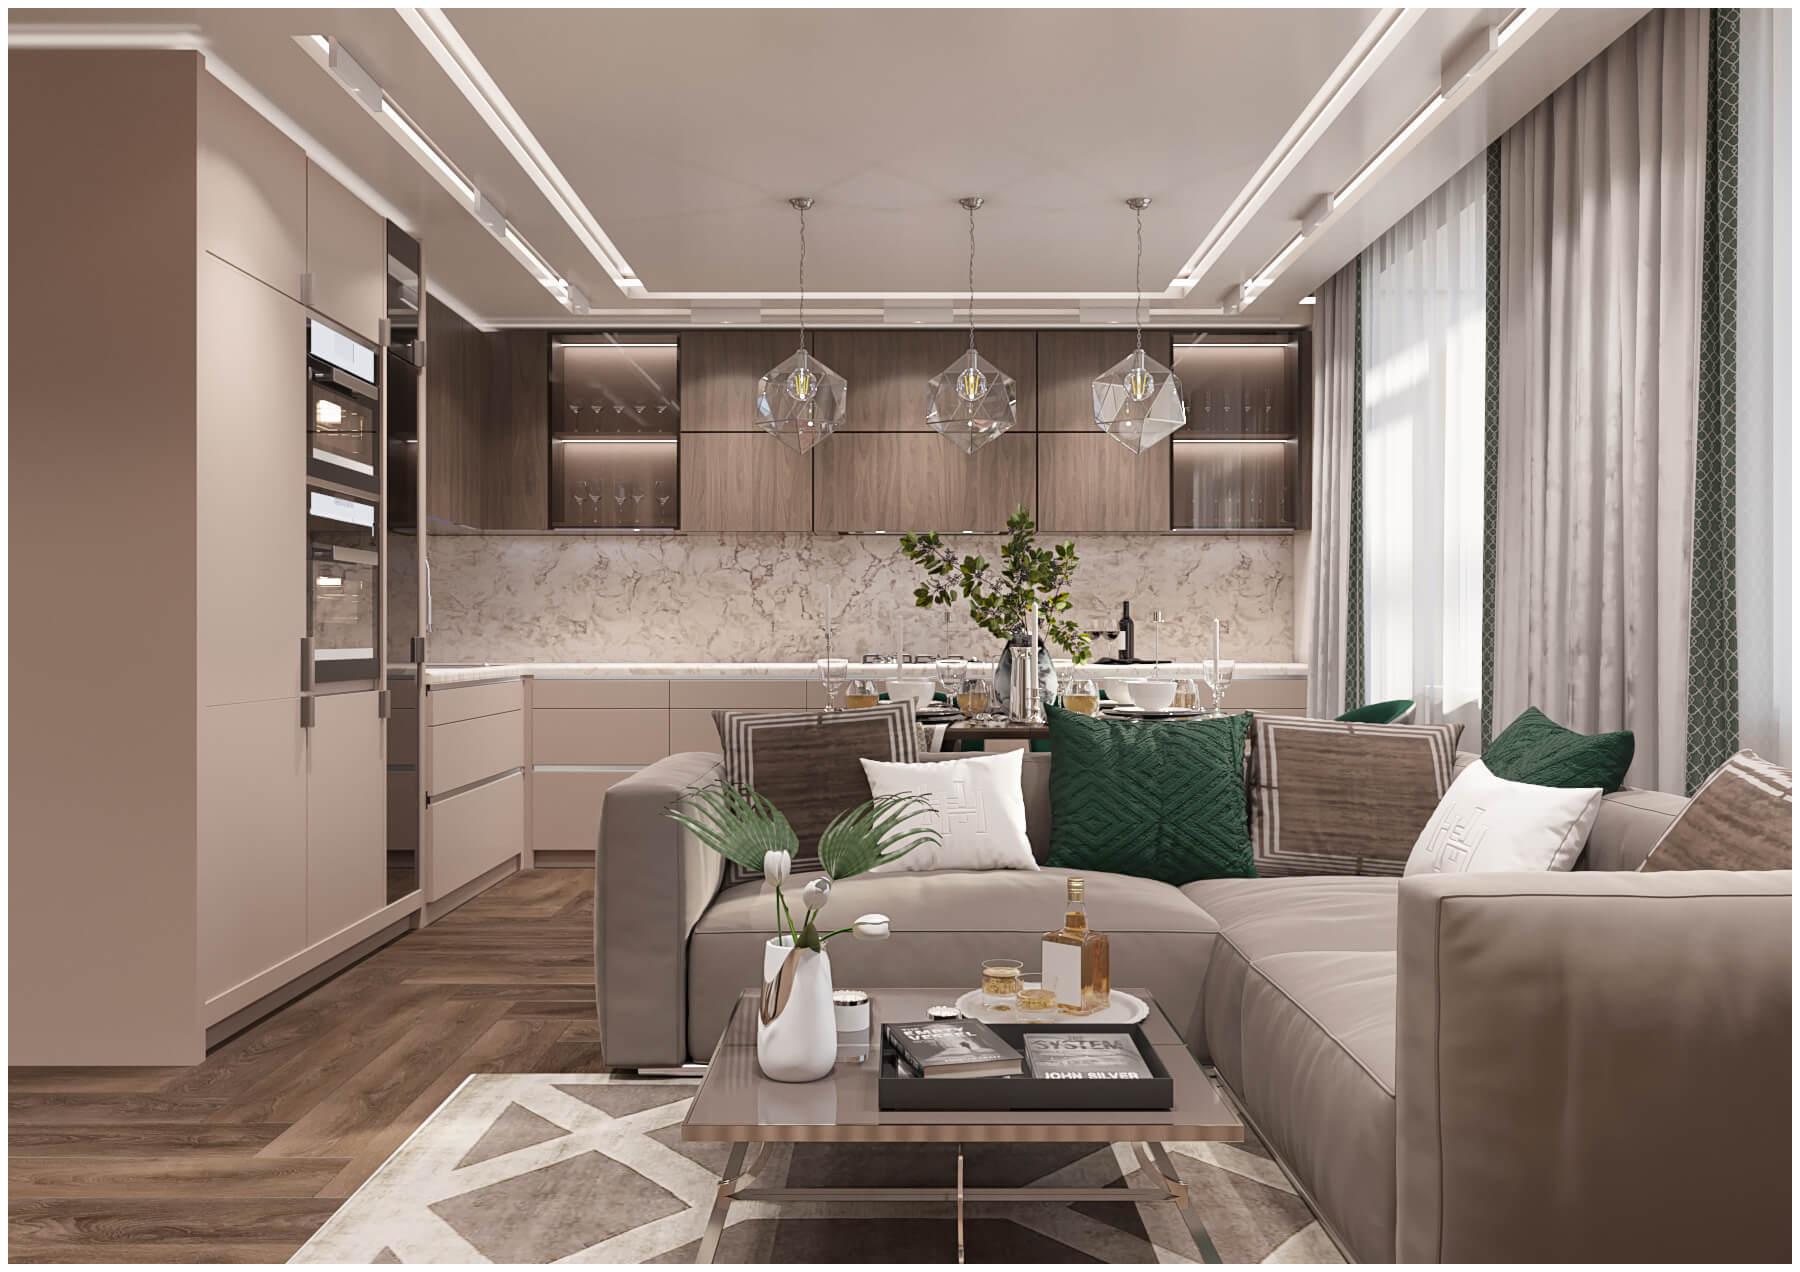 кухня гостиная ракурс1 дизайн студия Tatyana жykova